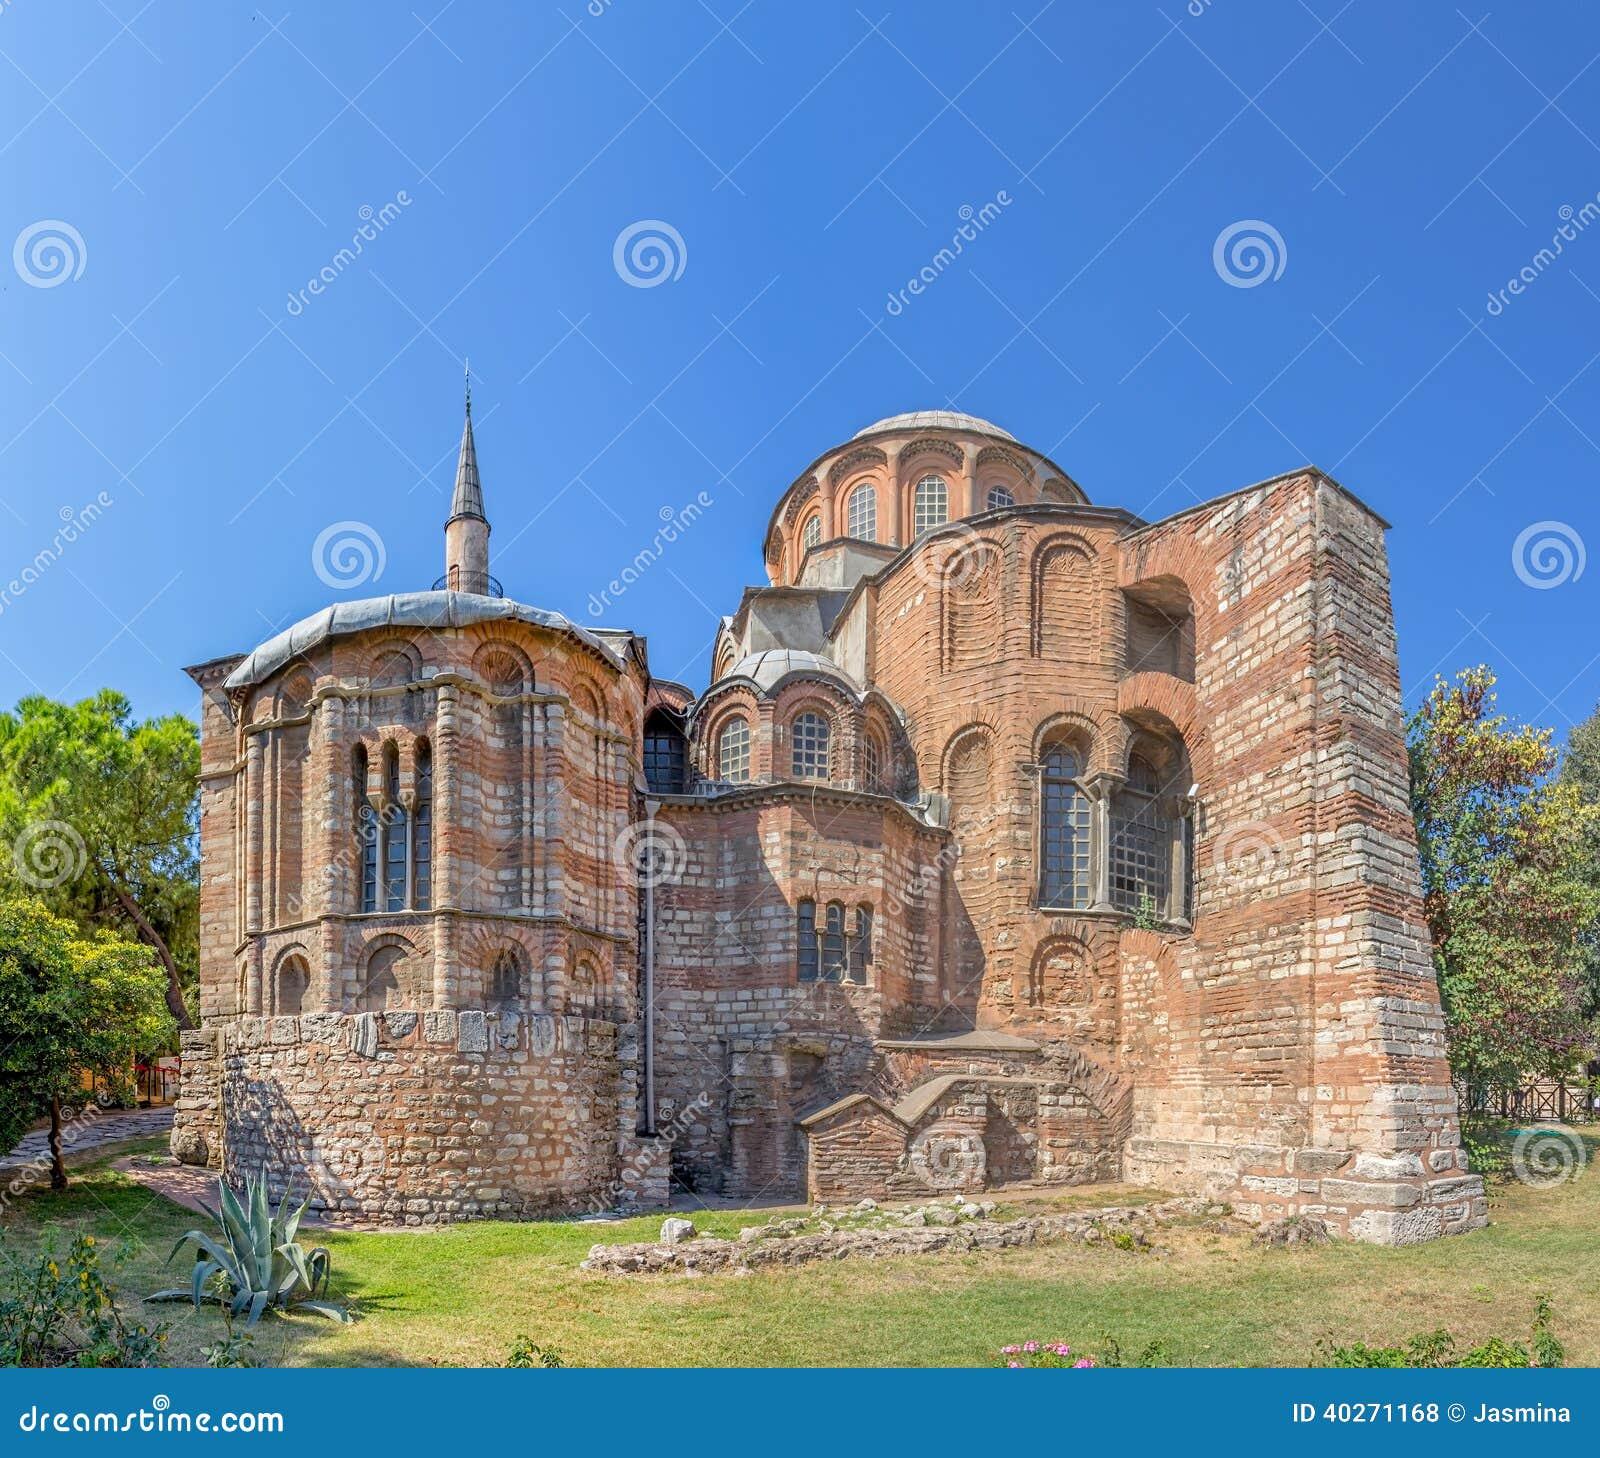 Chora-Museum - Kirche in Istanbul